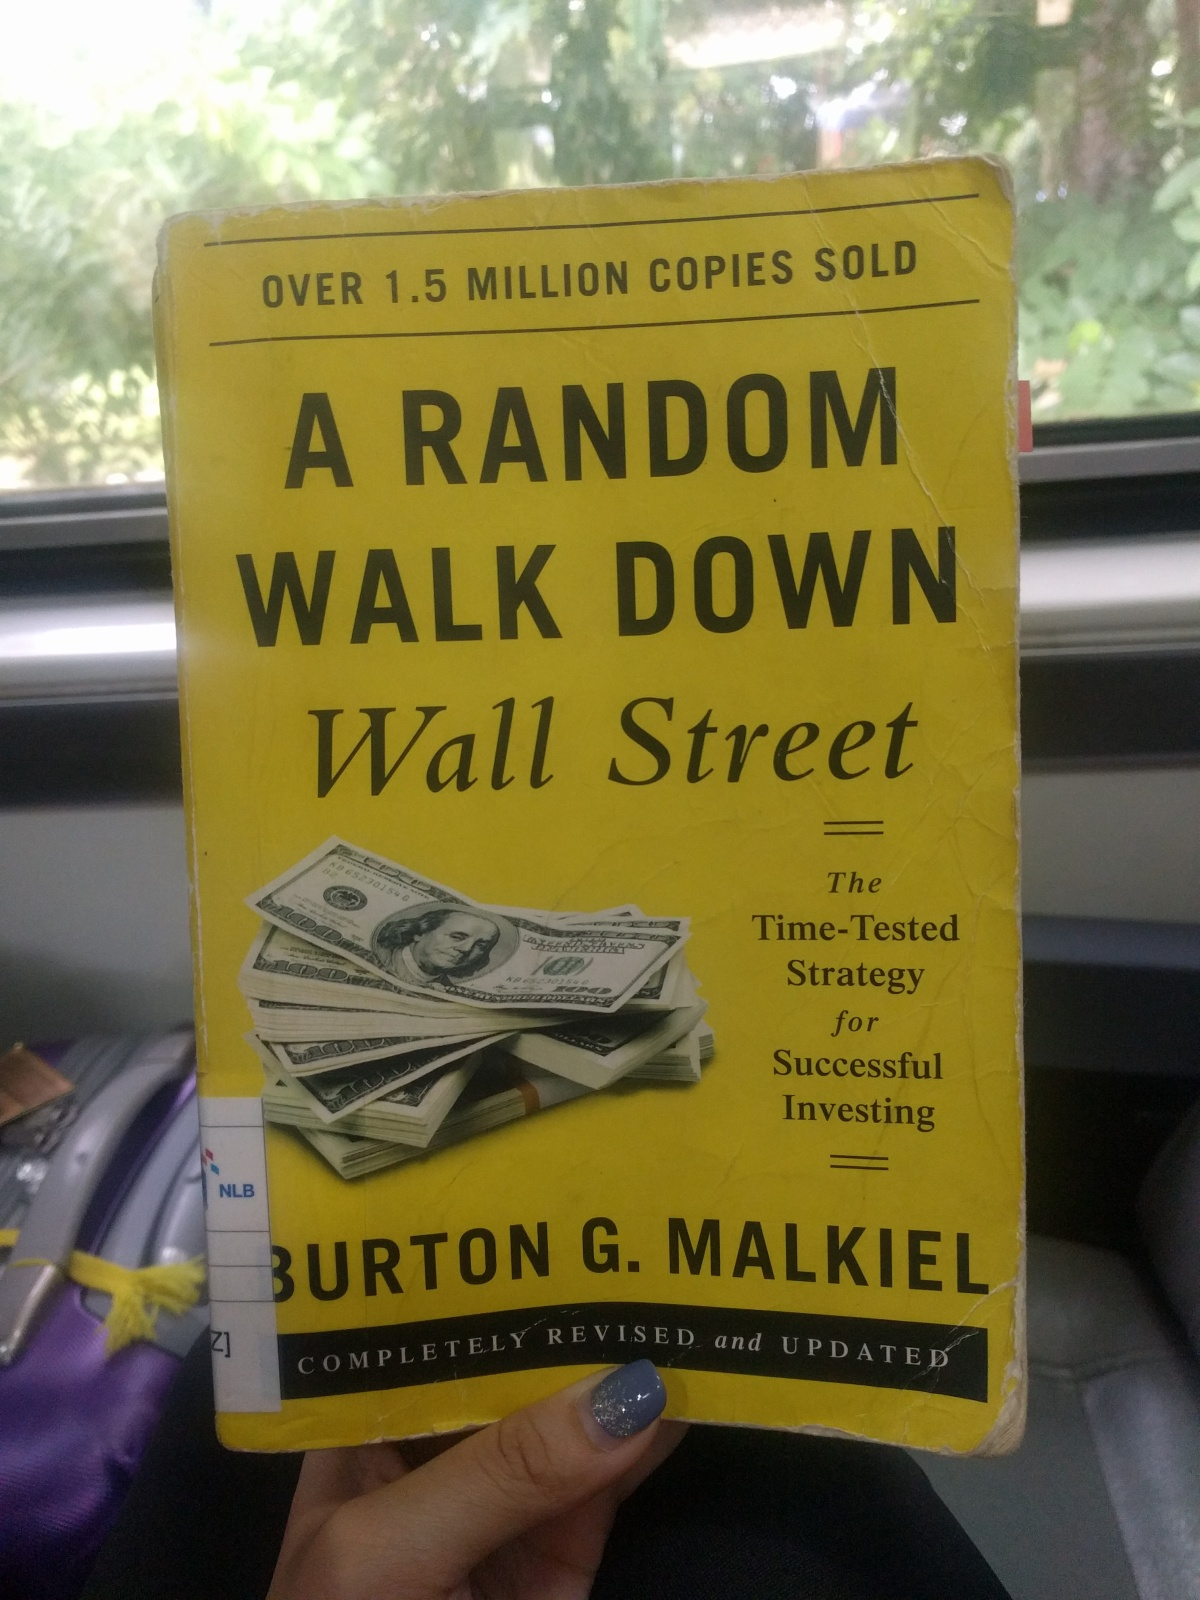 Book Review: A Random Walk Down Wall Street by Burton G.Malkiel